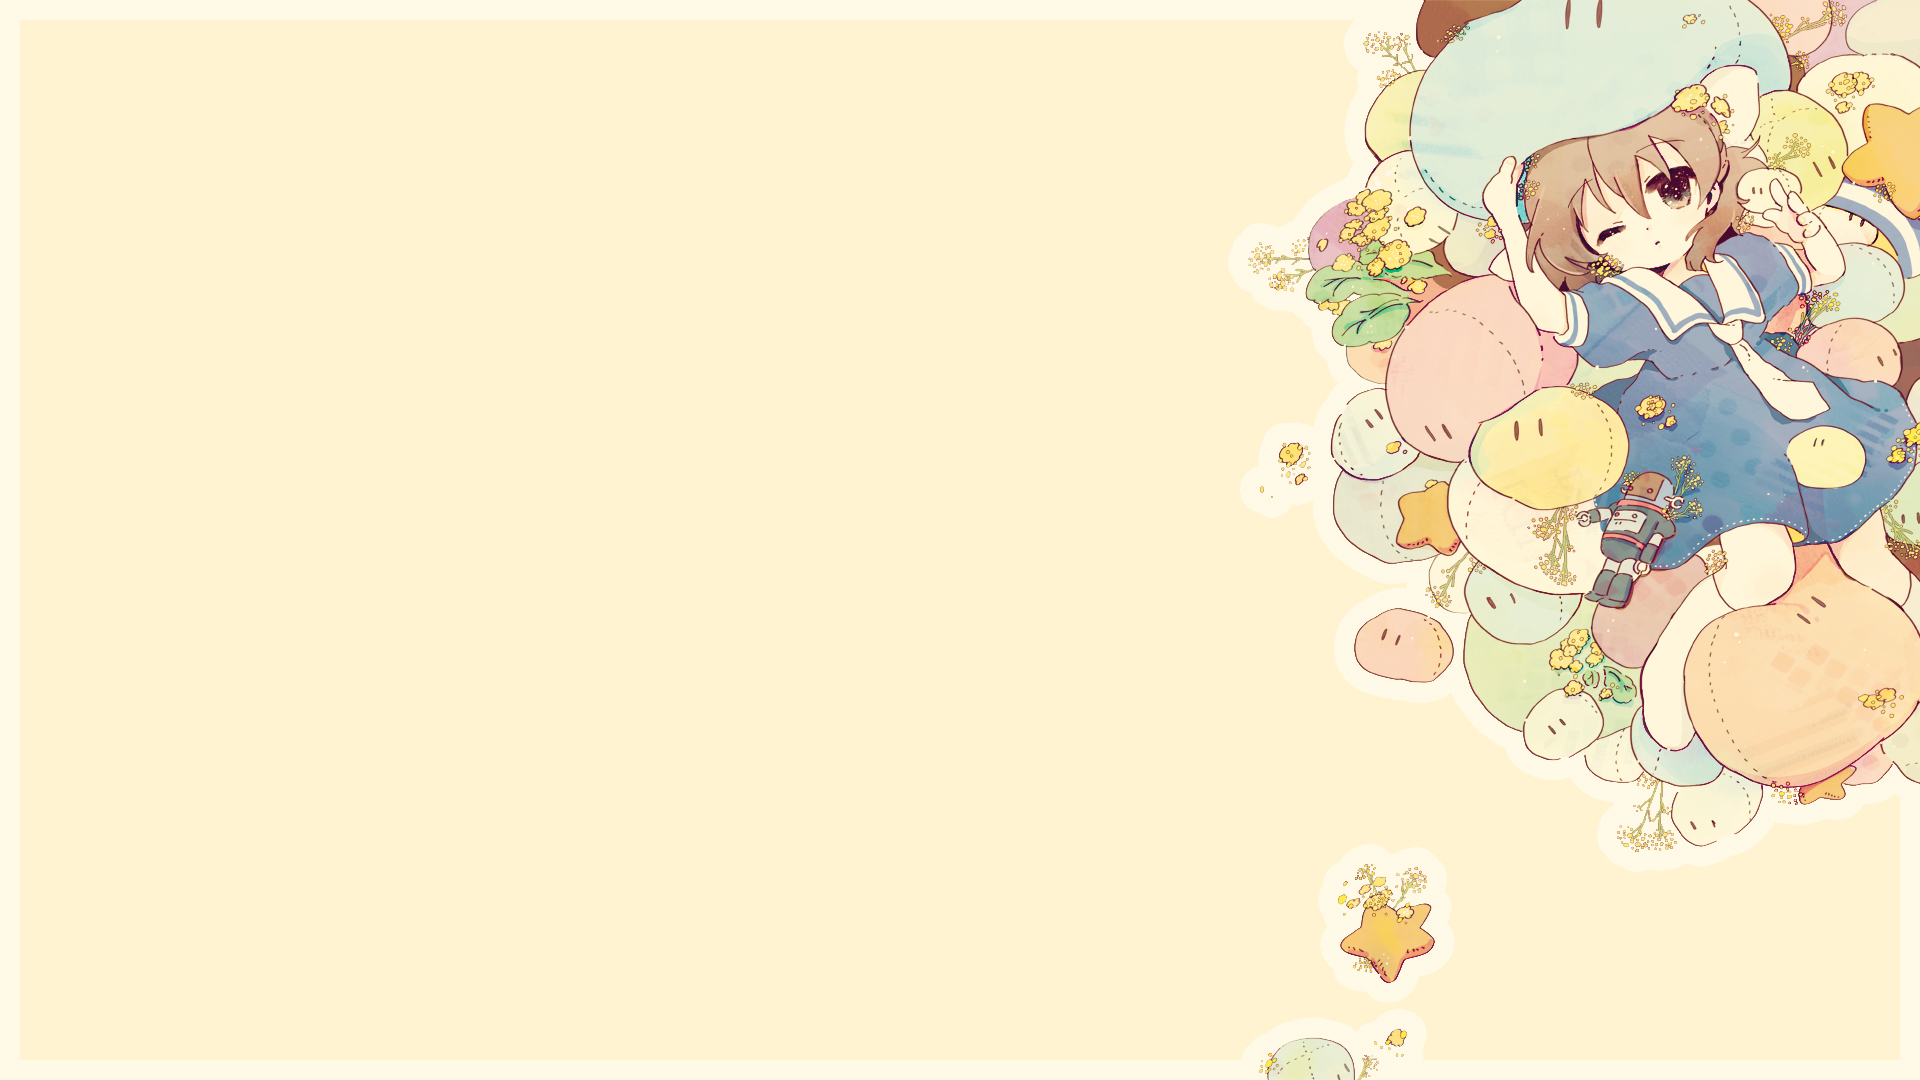 Clannad Hd Wallpaper Background Image 1920x1080 Id745167